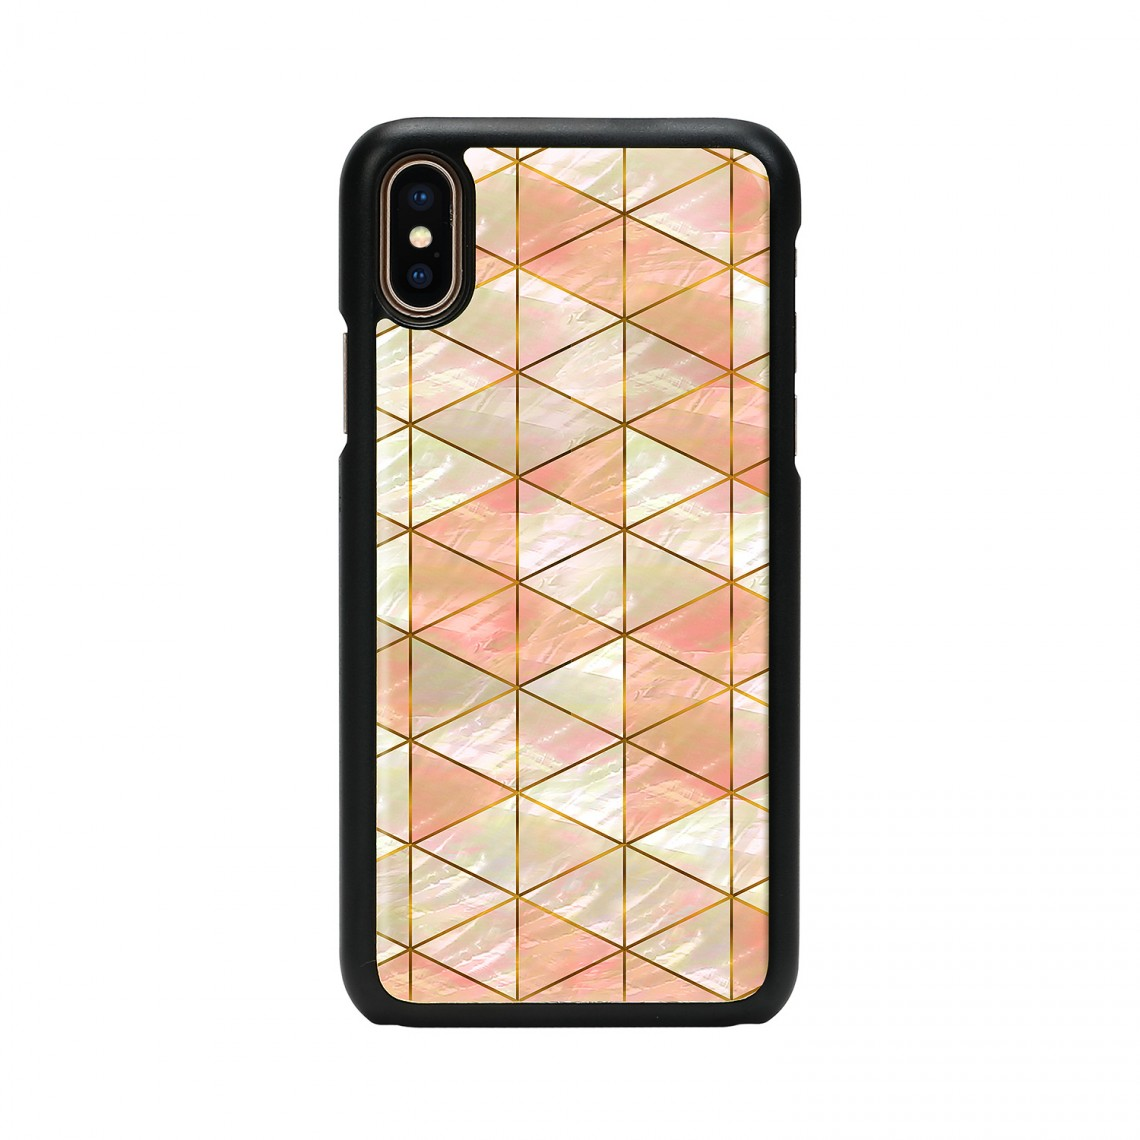 iPhone XR ケース 天然貝 ikins Diamond(アイキンス ダイヤモンド)